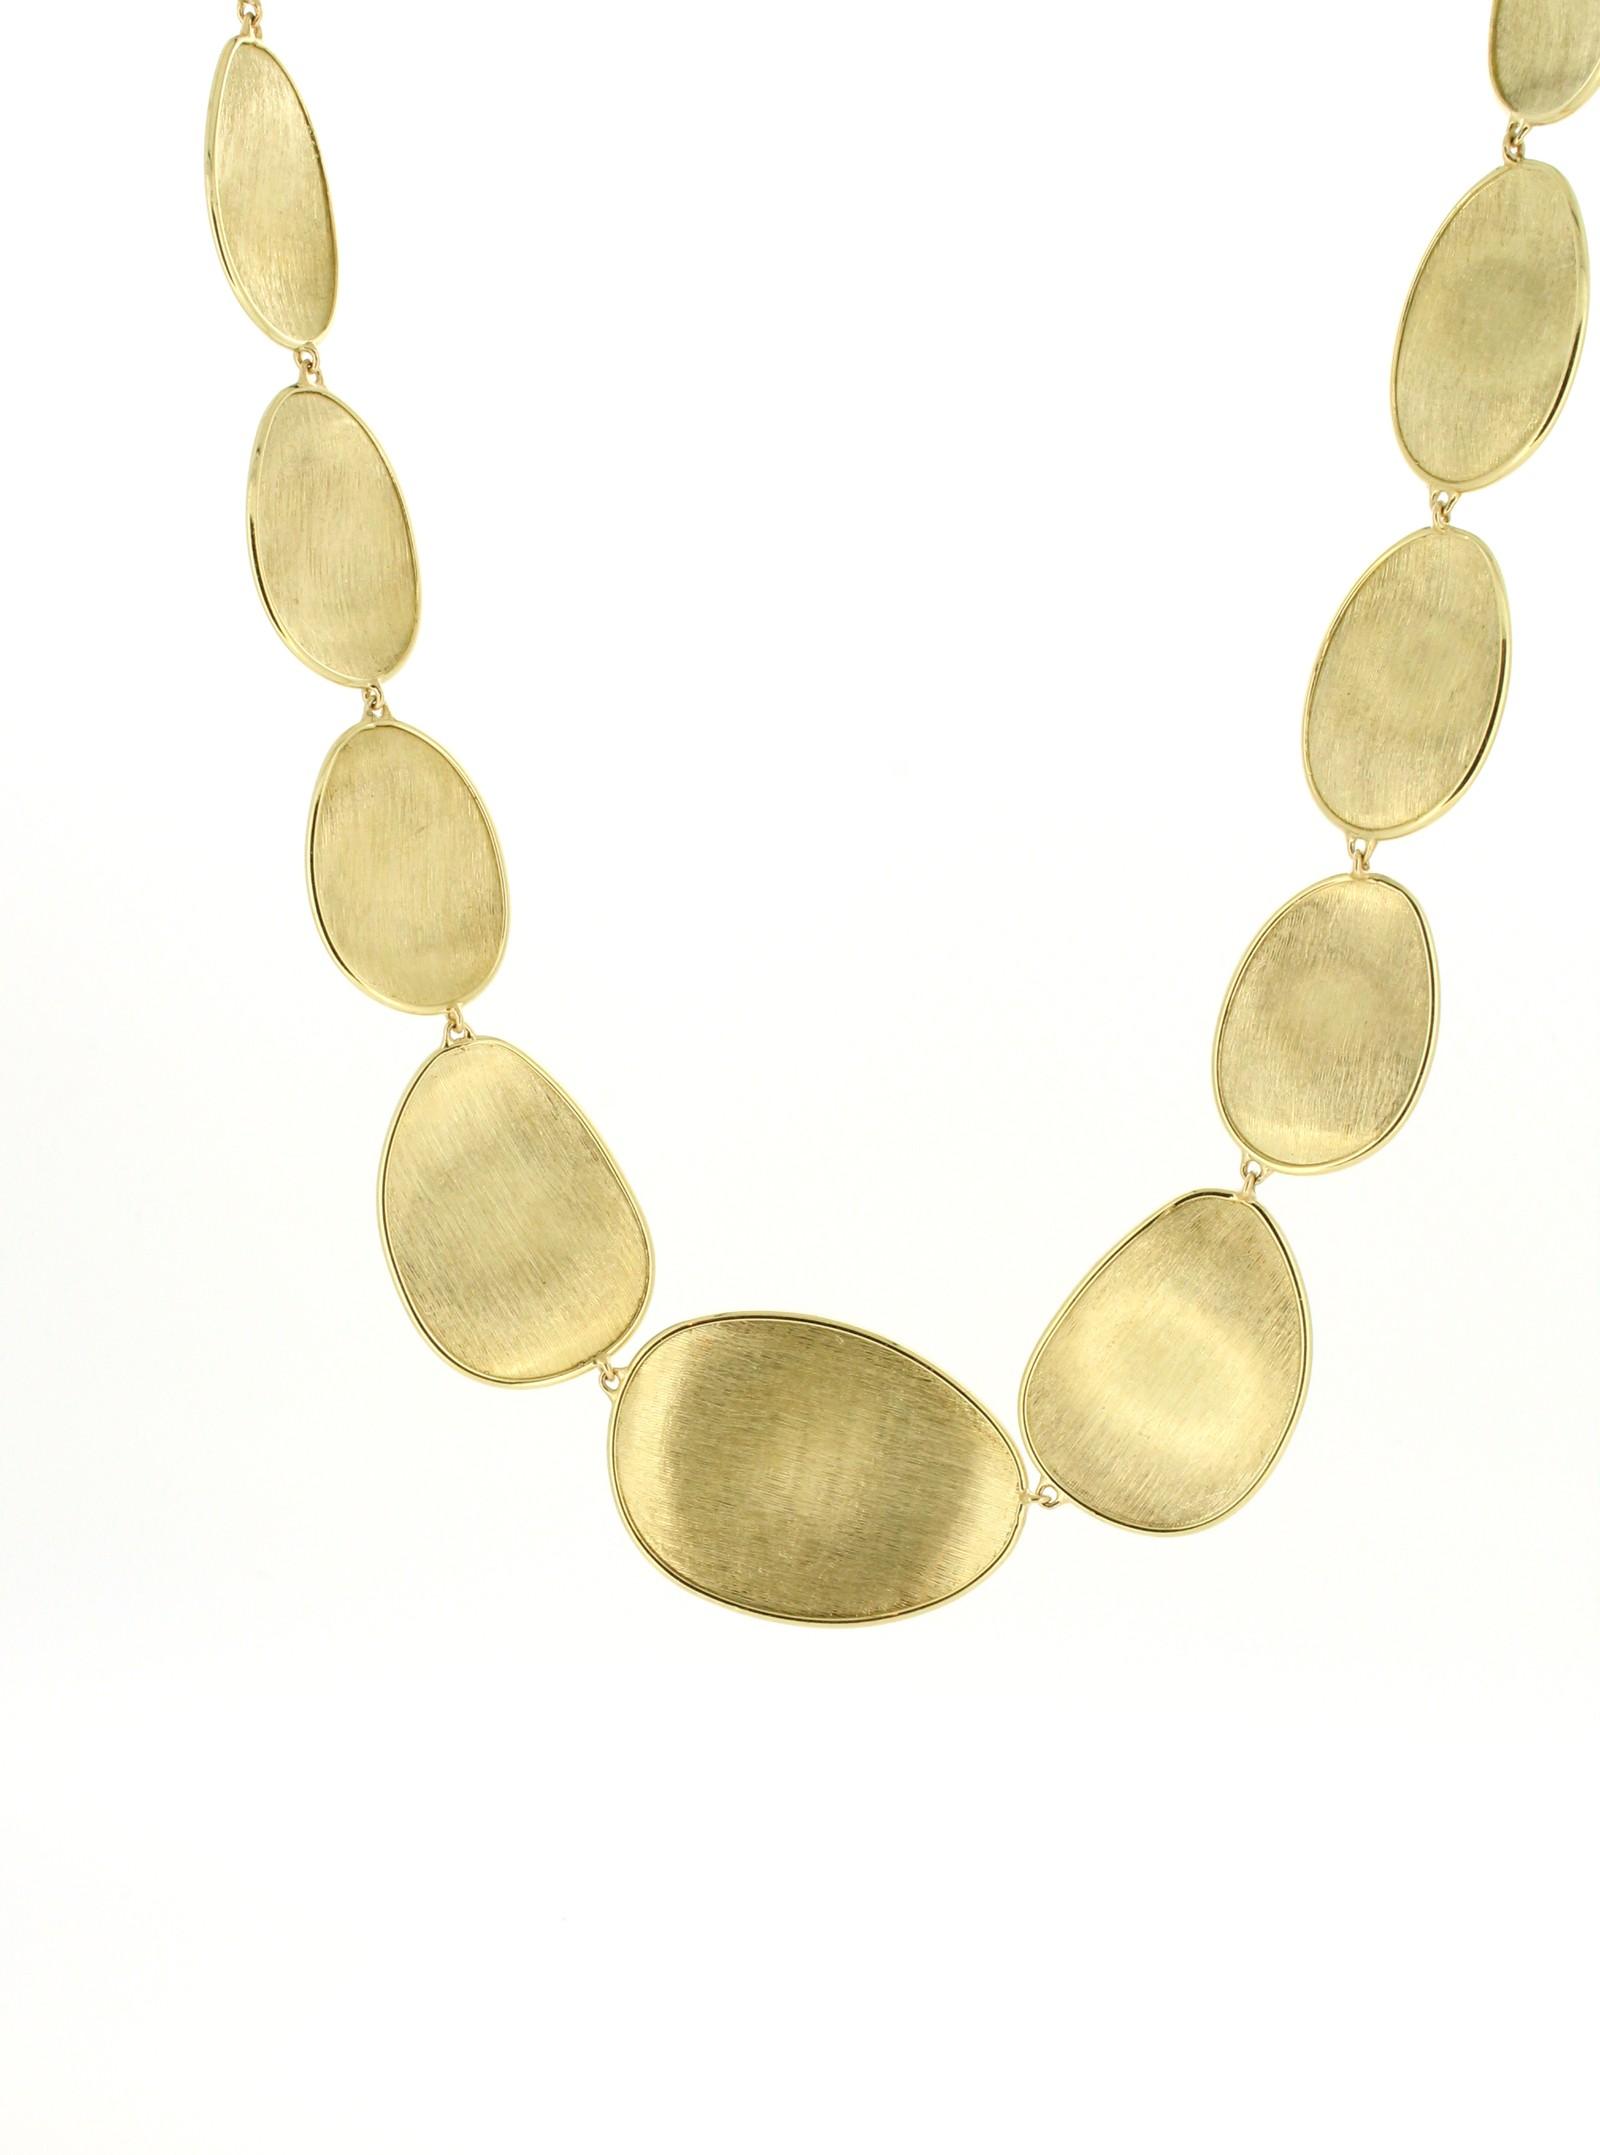 Kette Lunaria 18ct Gold - Marco Bicego - CB1975